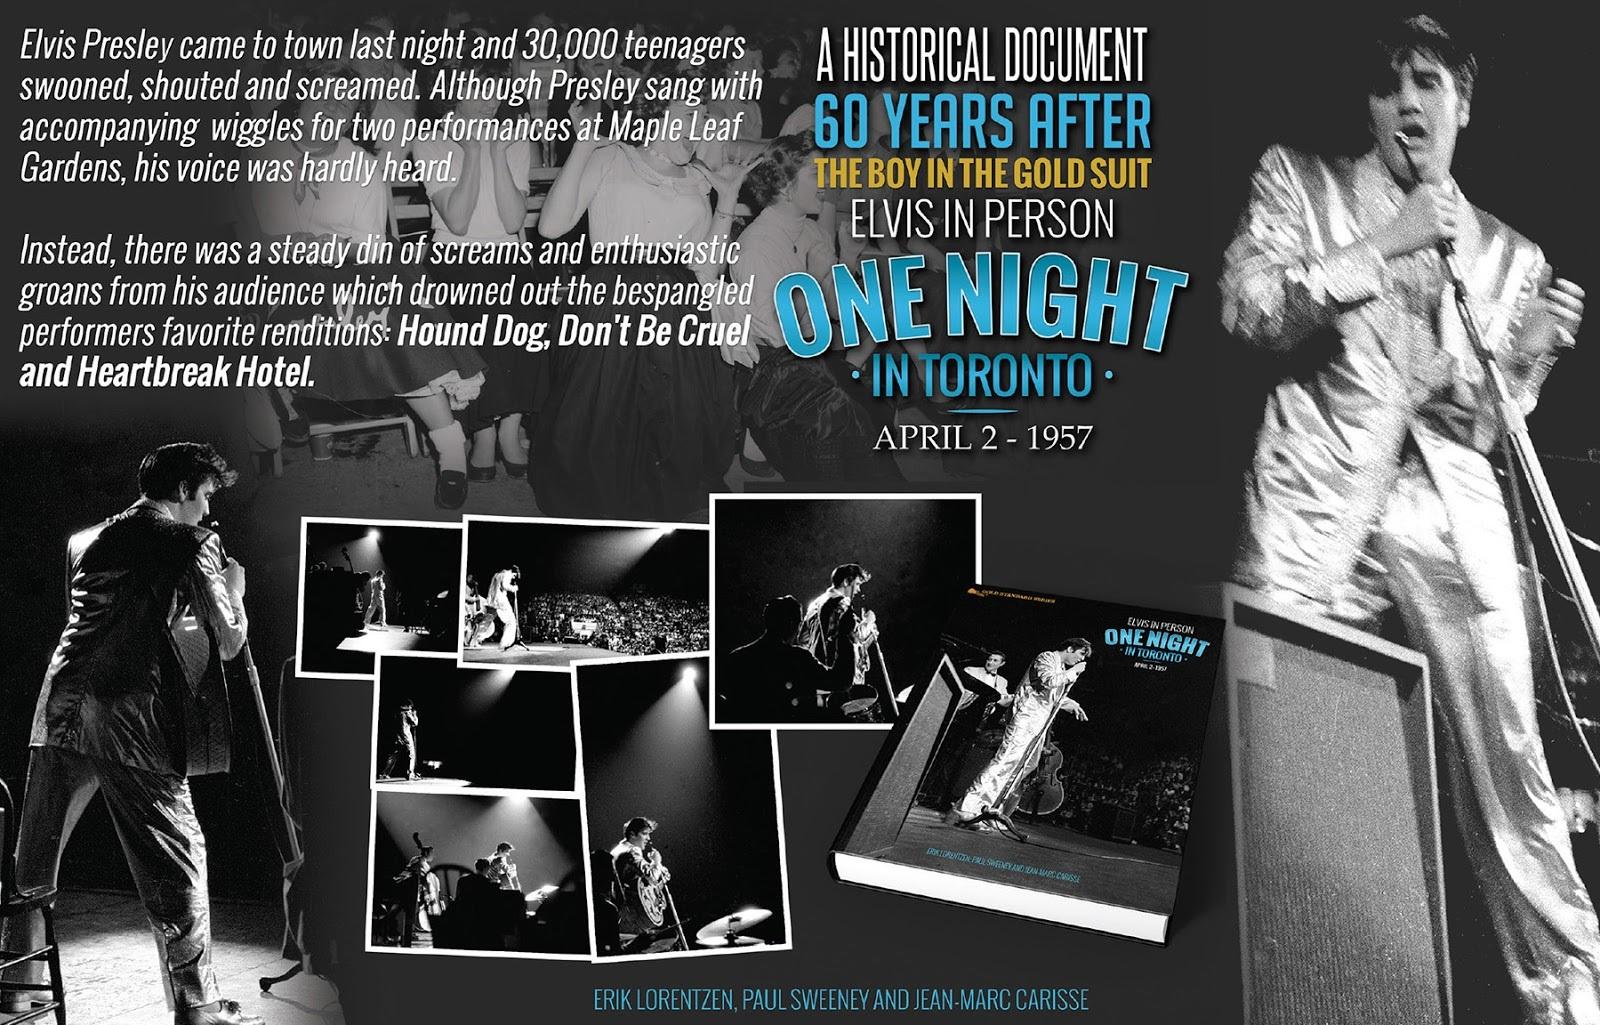 book_one_night_in_toronto_flyer_1_2016_12_20.jpg